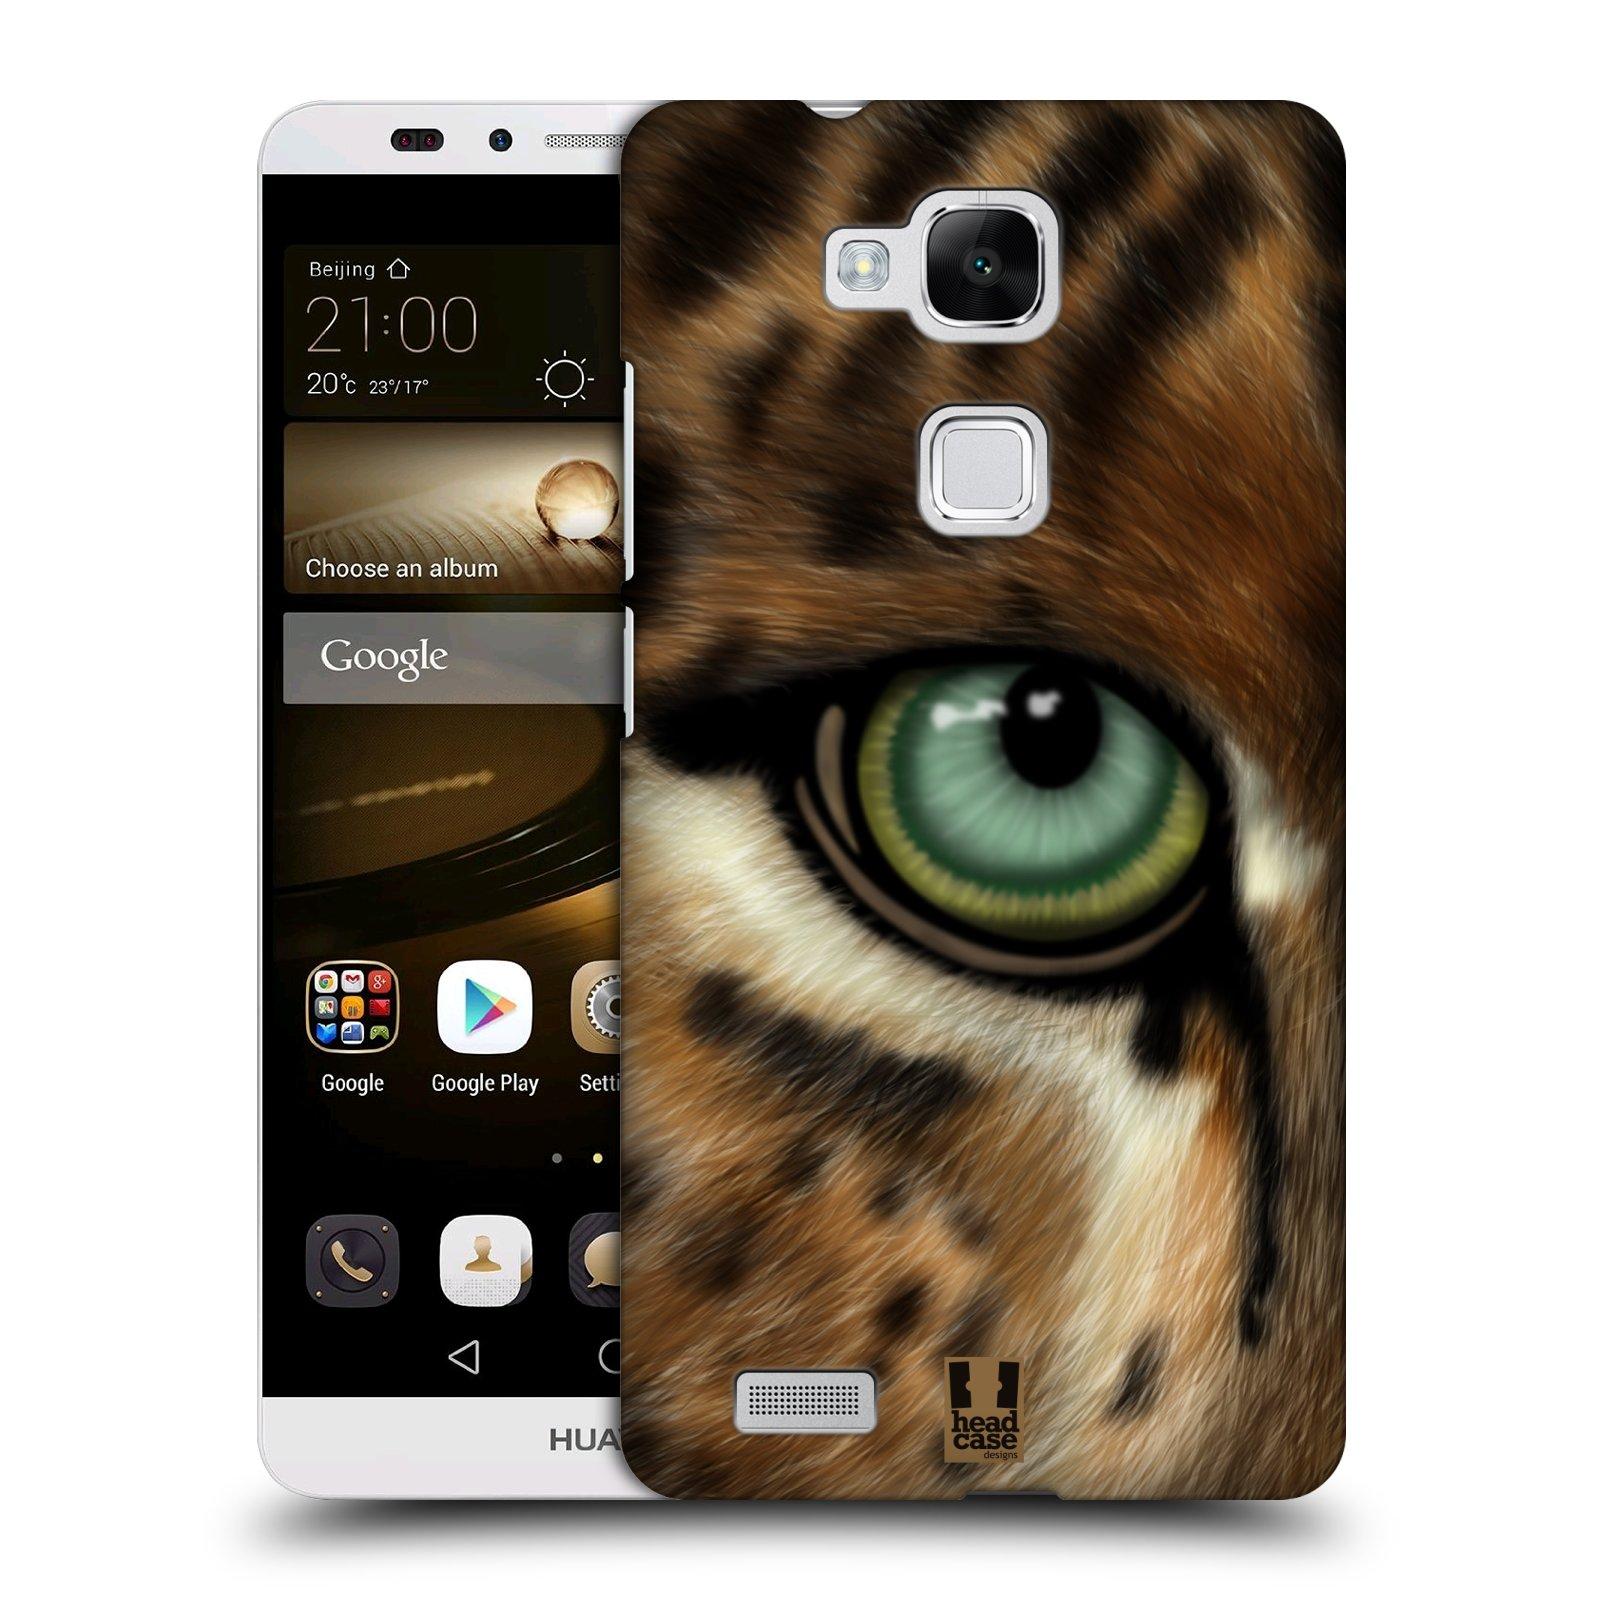 HEAD CASE plastový obal na mobil Huawei Mate 7 vzor pohled zvířete oko leopard